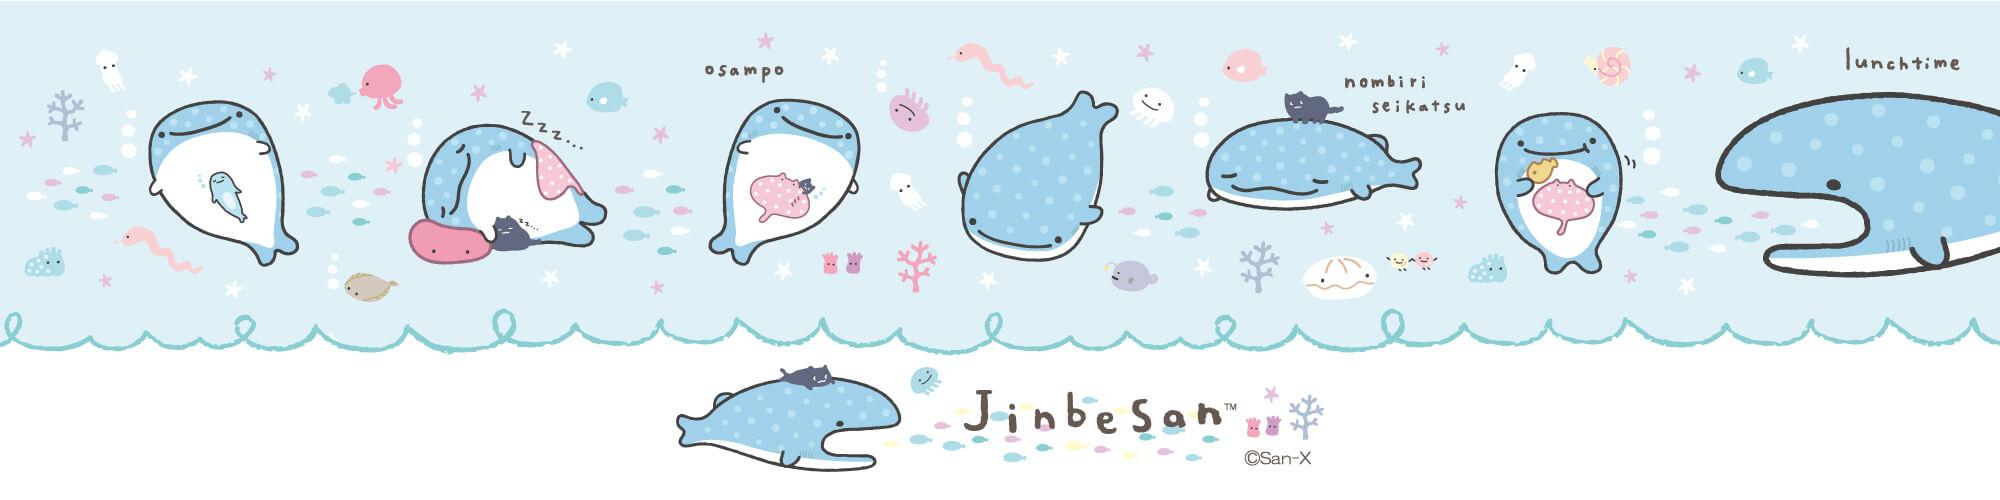 jinbesan-categorybanner.jpg